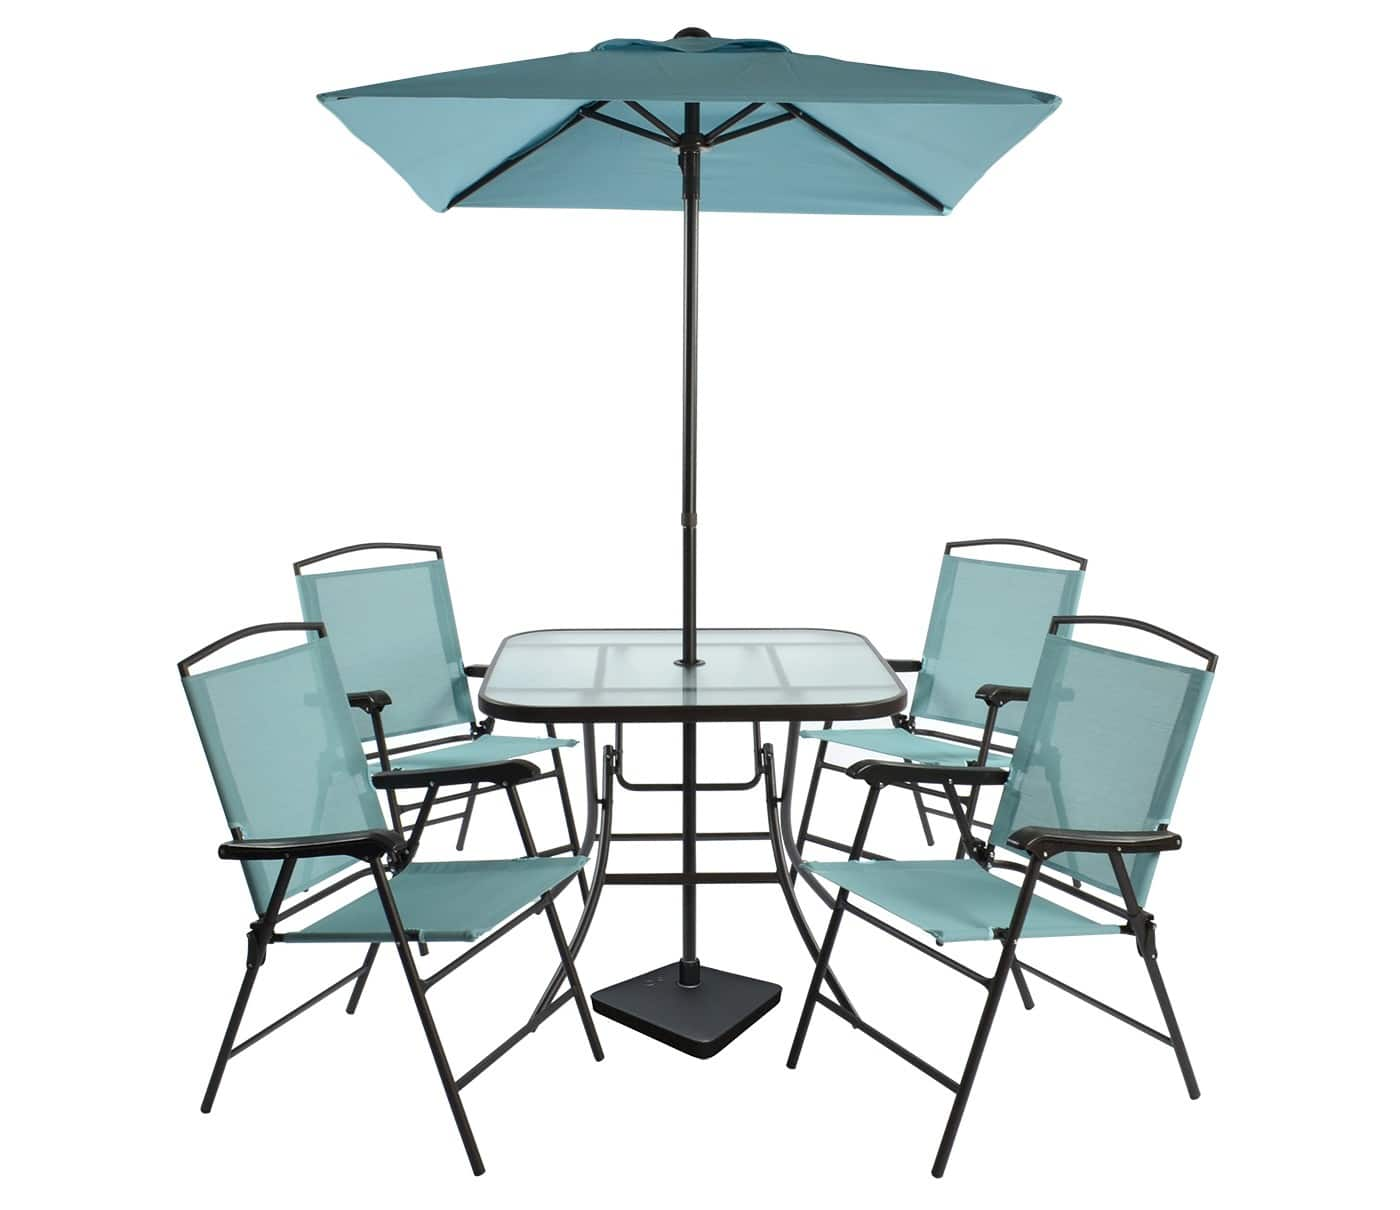 7pc Metal Folding Patio Dining Set $84. Reg $130. Free in store pick ...